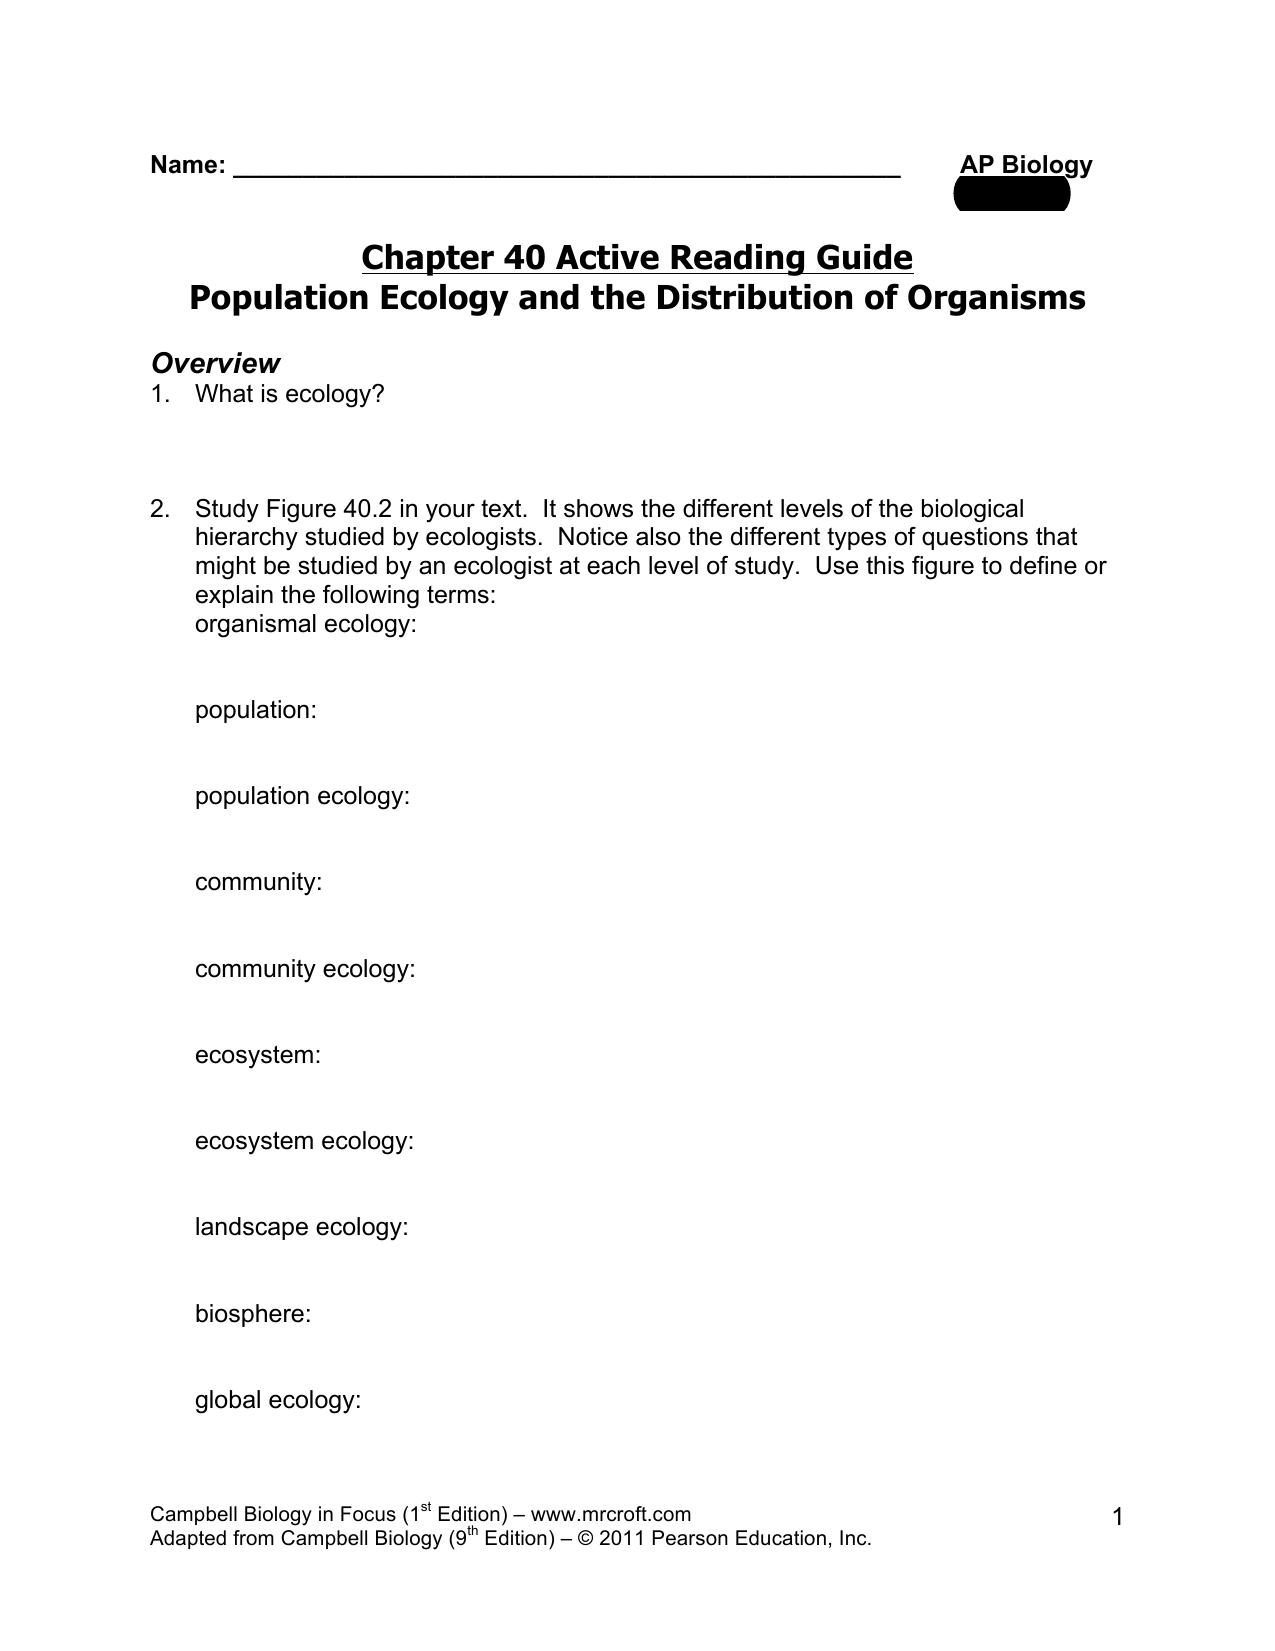 ap biology population ecology